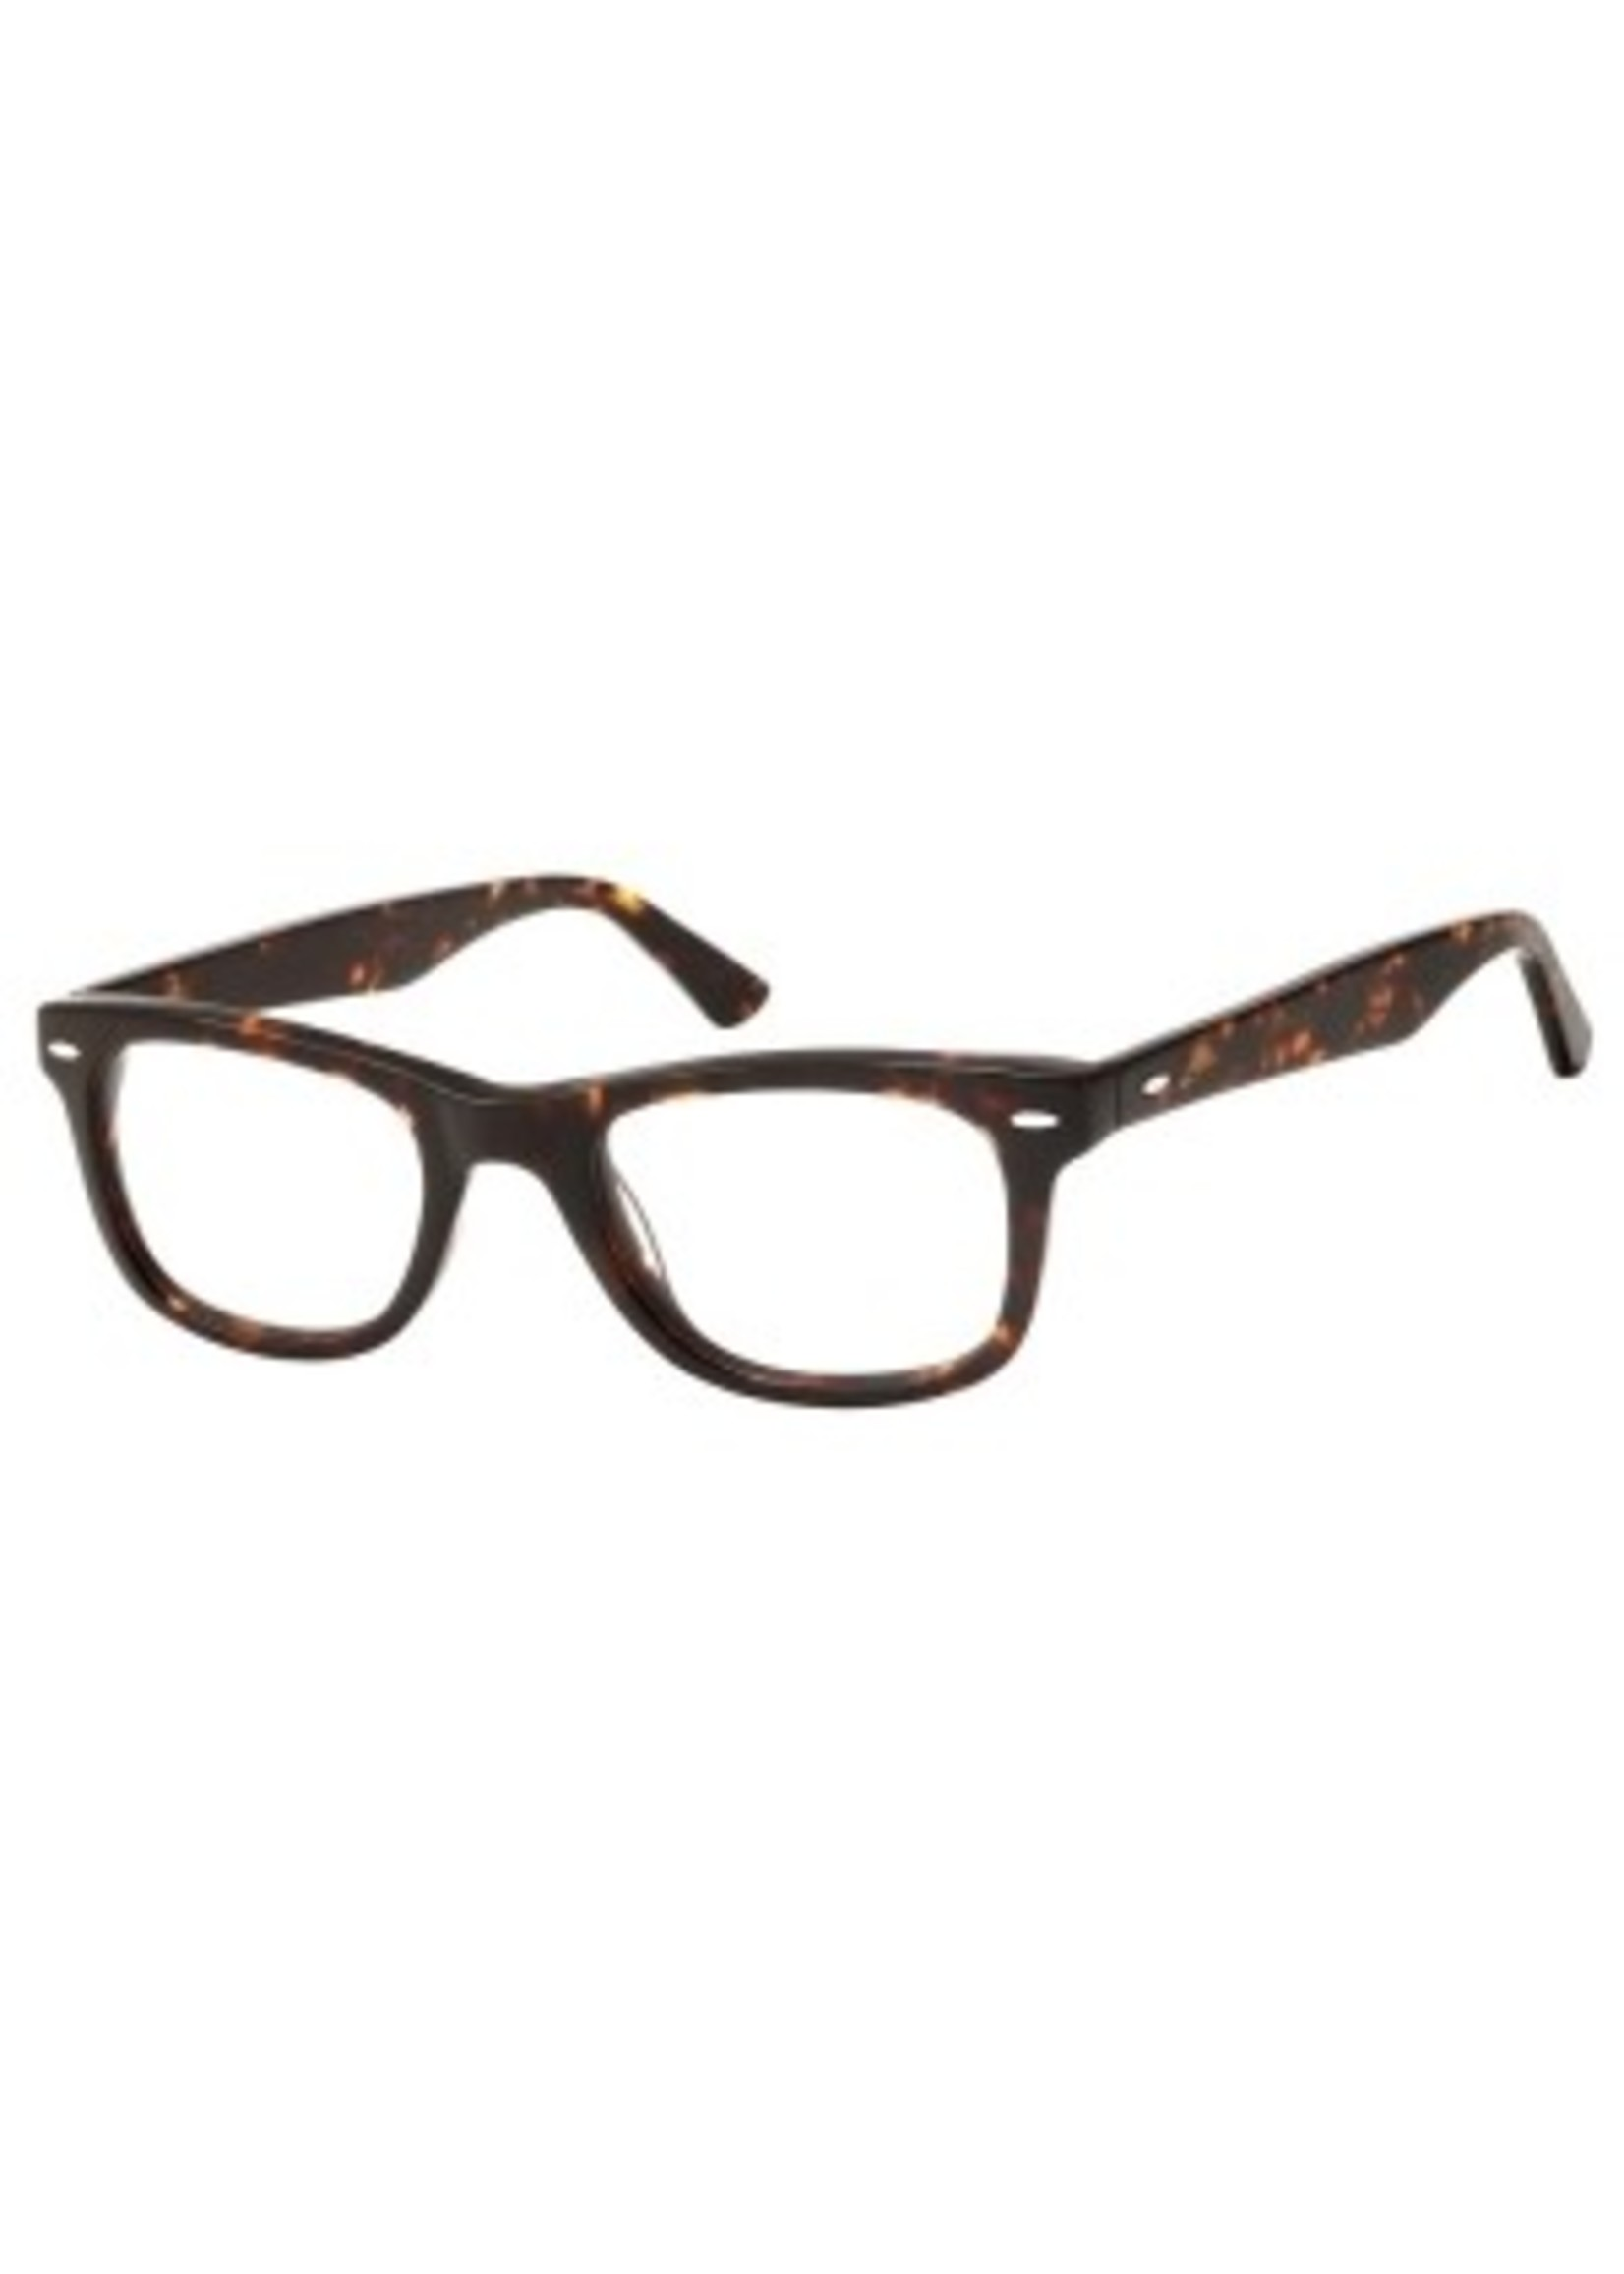 wayfarer leesbril in havanna bruin